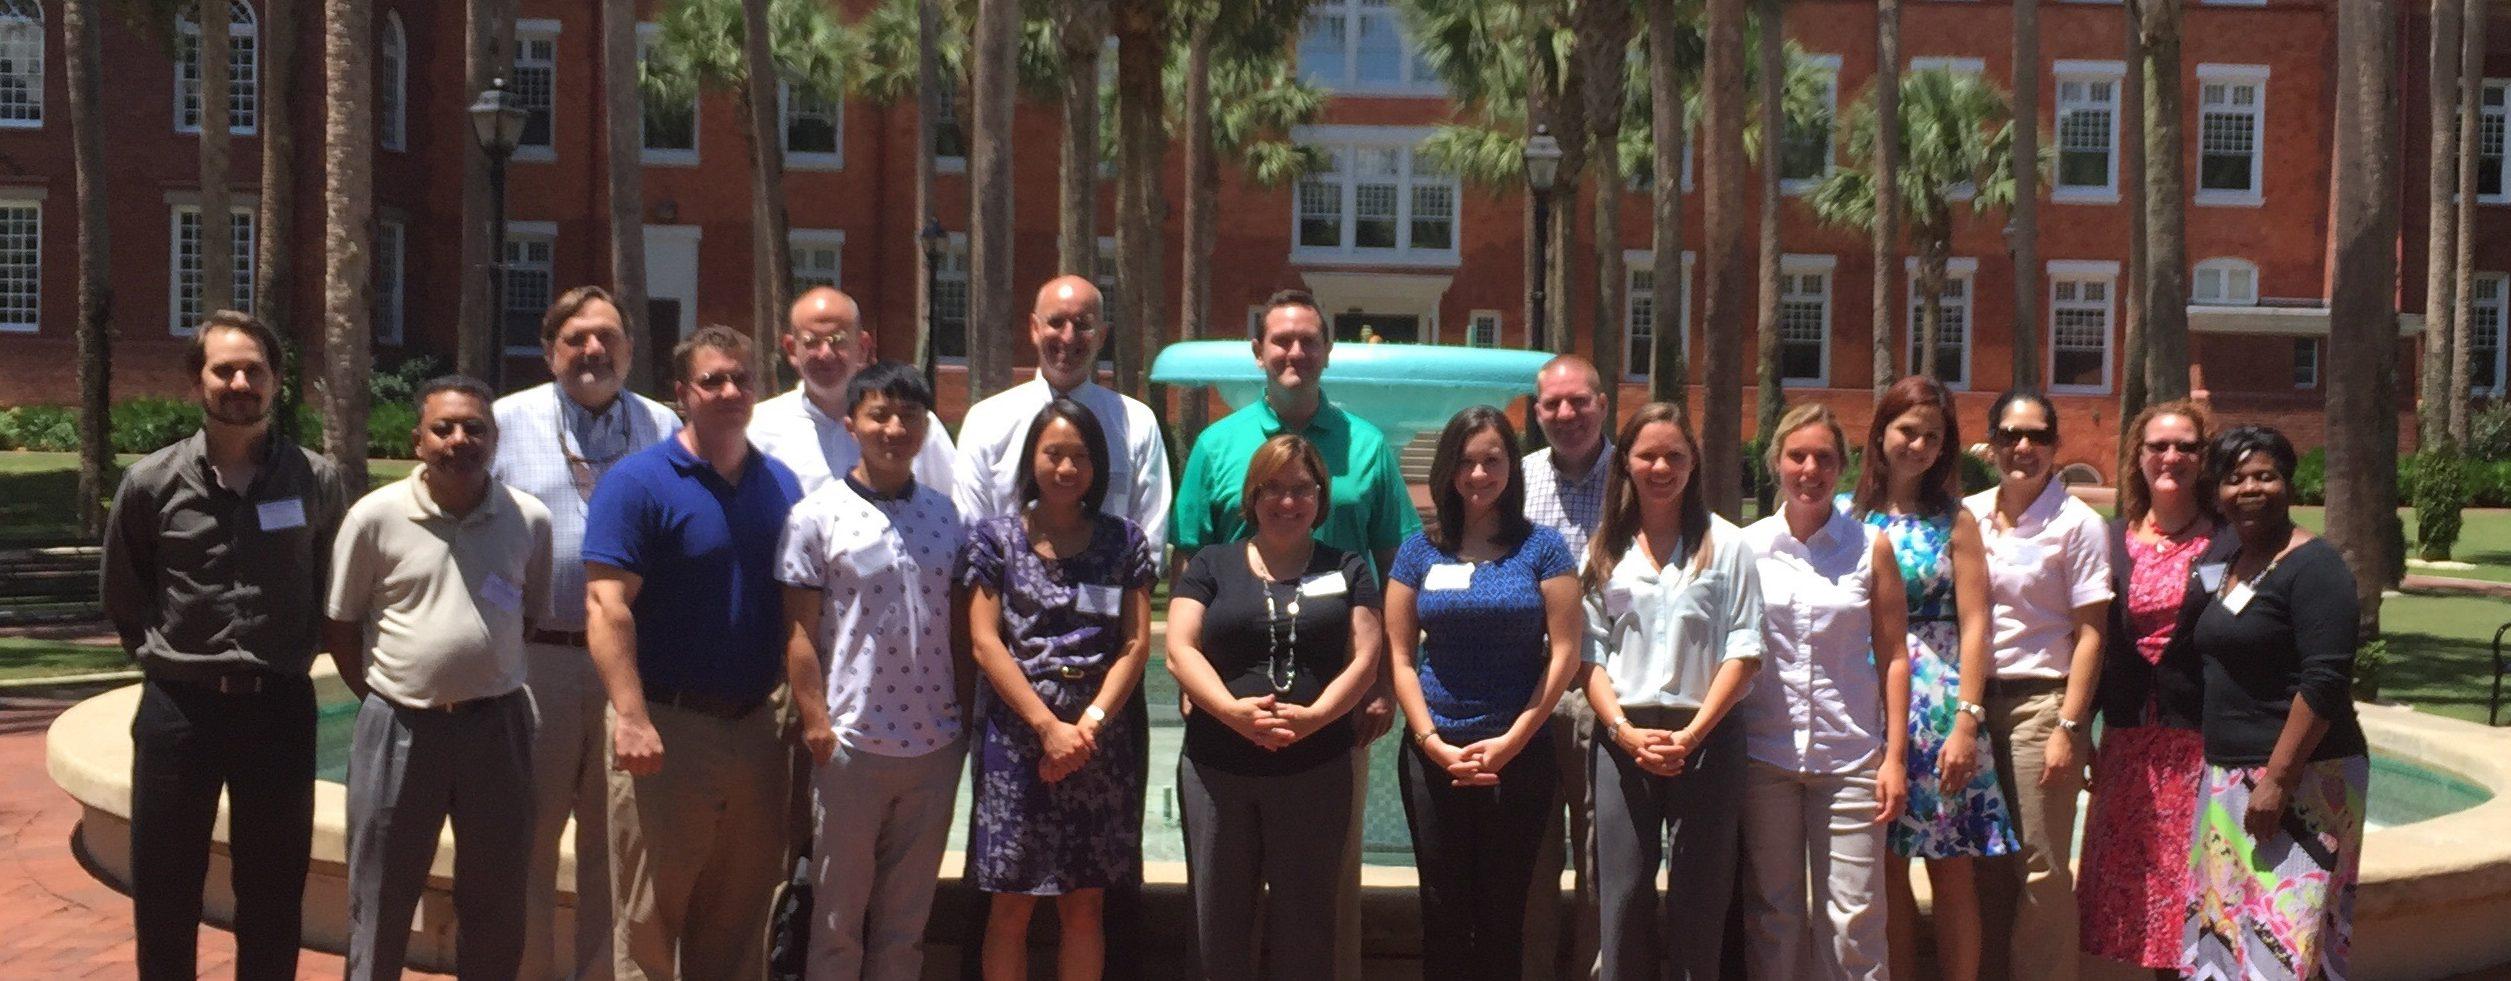 New fulltime faculty 2015